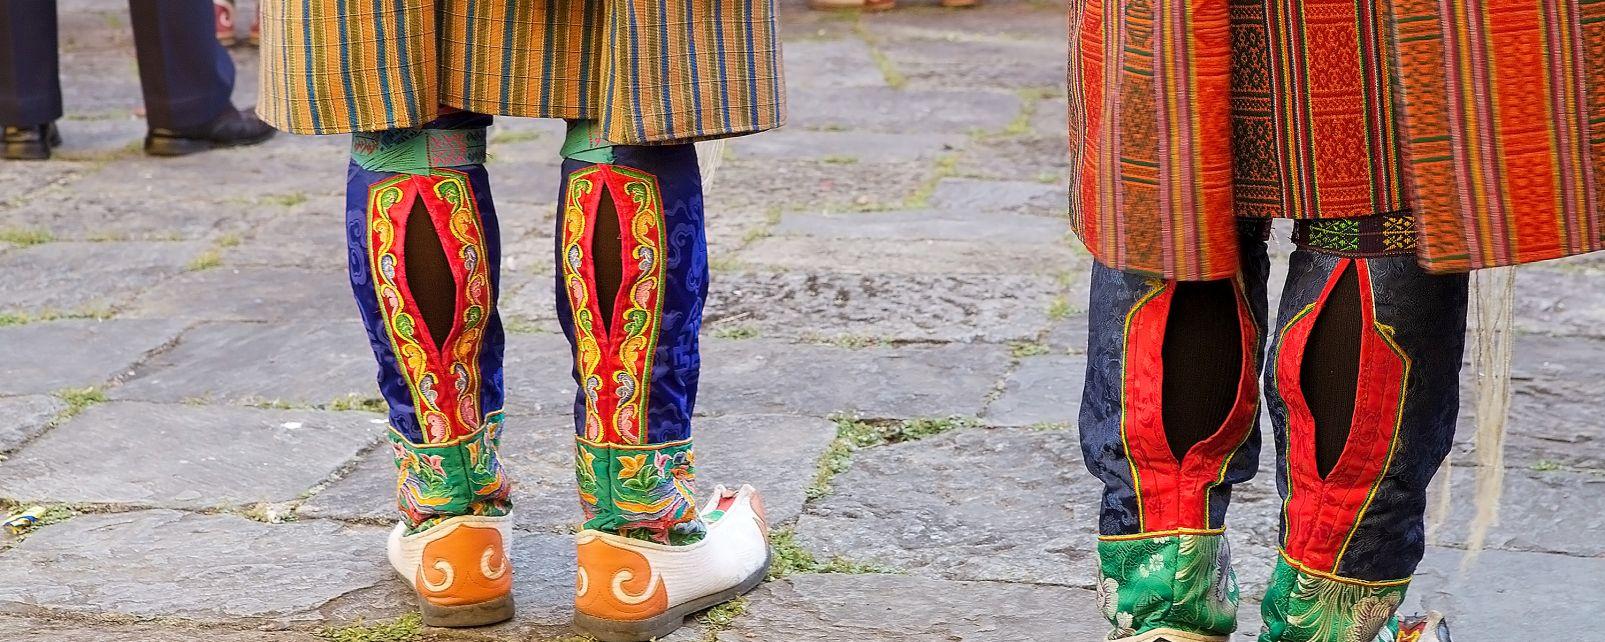 El dzong de Simtokha, Arquitectura religiosa, Bután